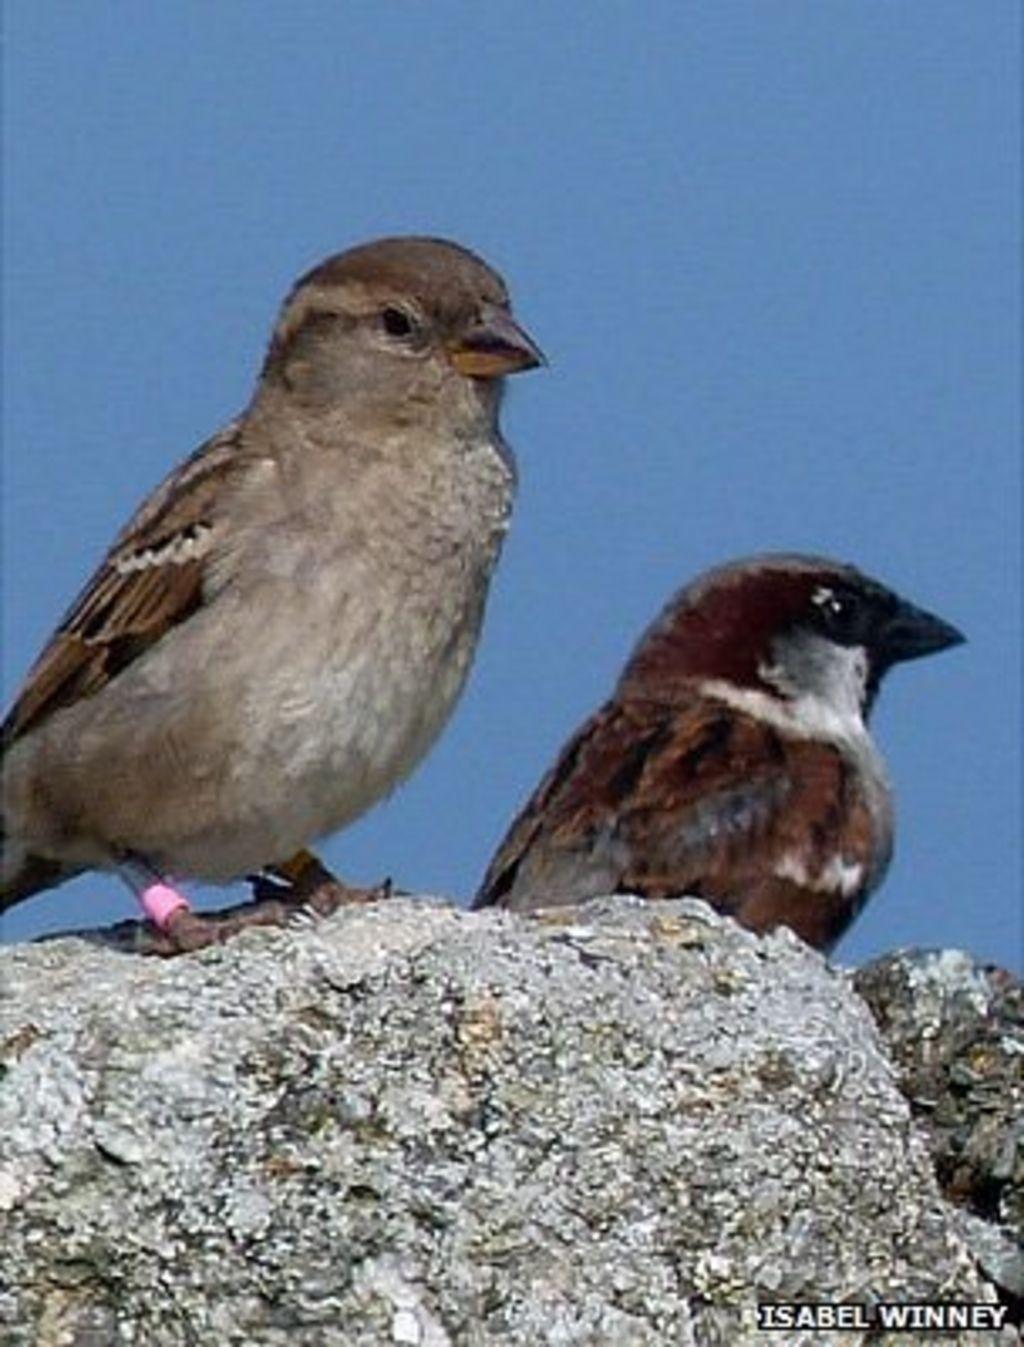 Urban noise 'killing baby house sparrows' - BBC News